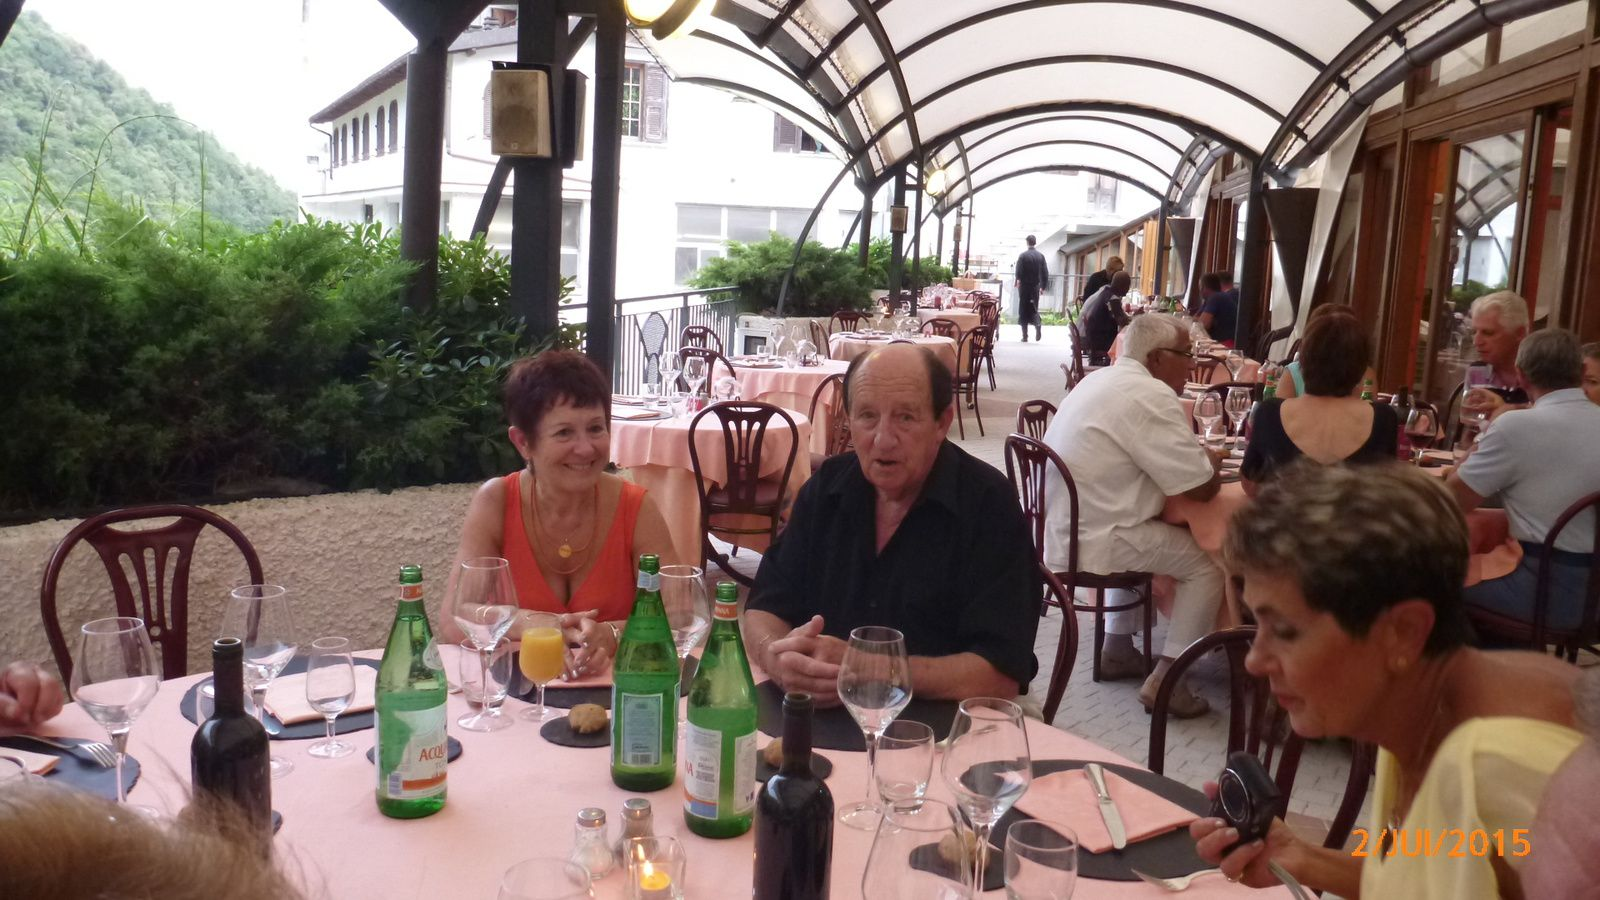 L' Hotel Ristorante Lago Bin qui se trouve à Rocchetta Nervina, immergé dans la nature luxuriante ligurienne .